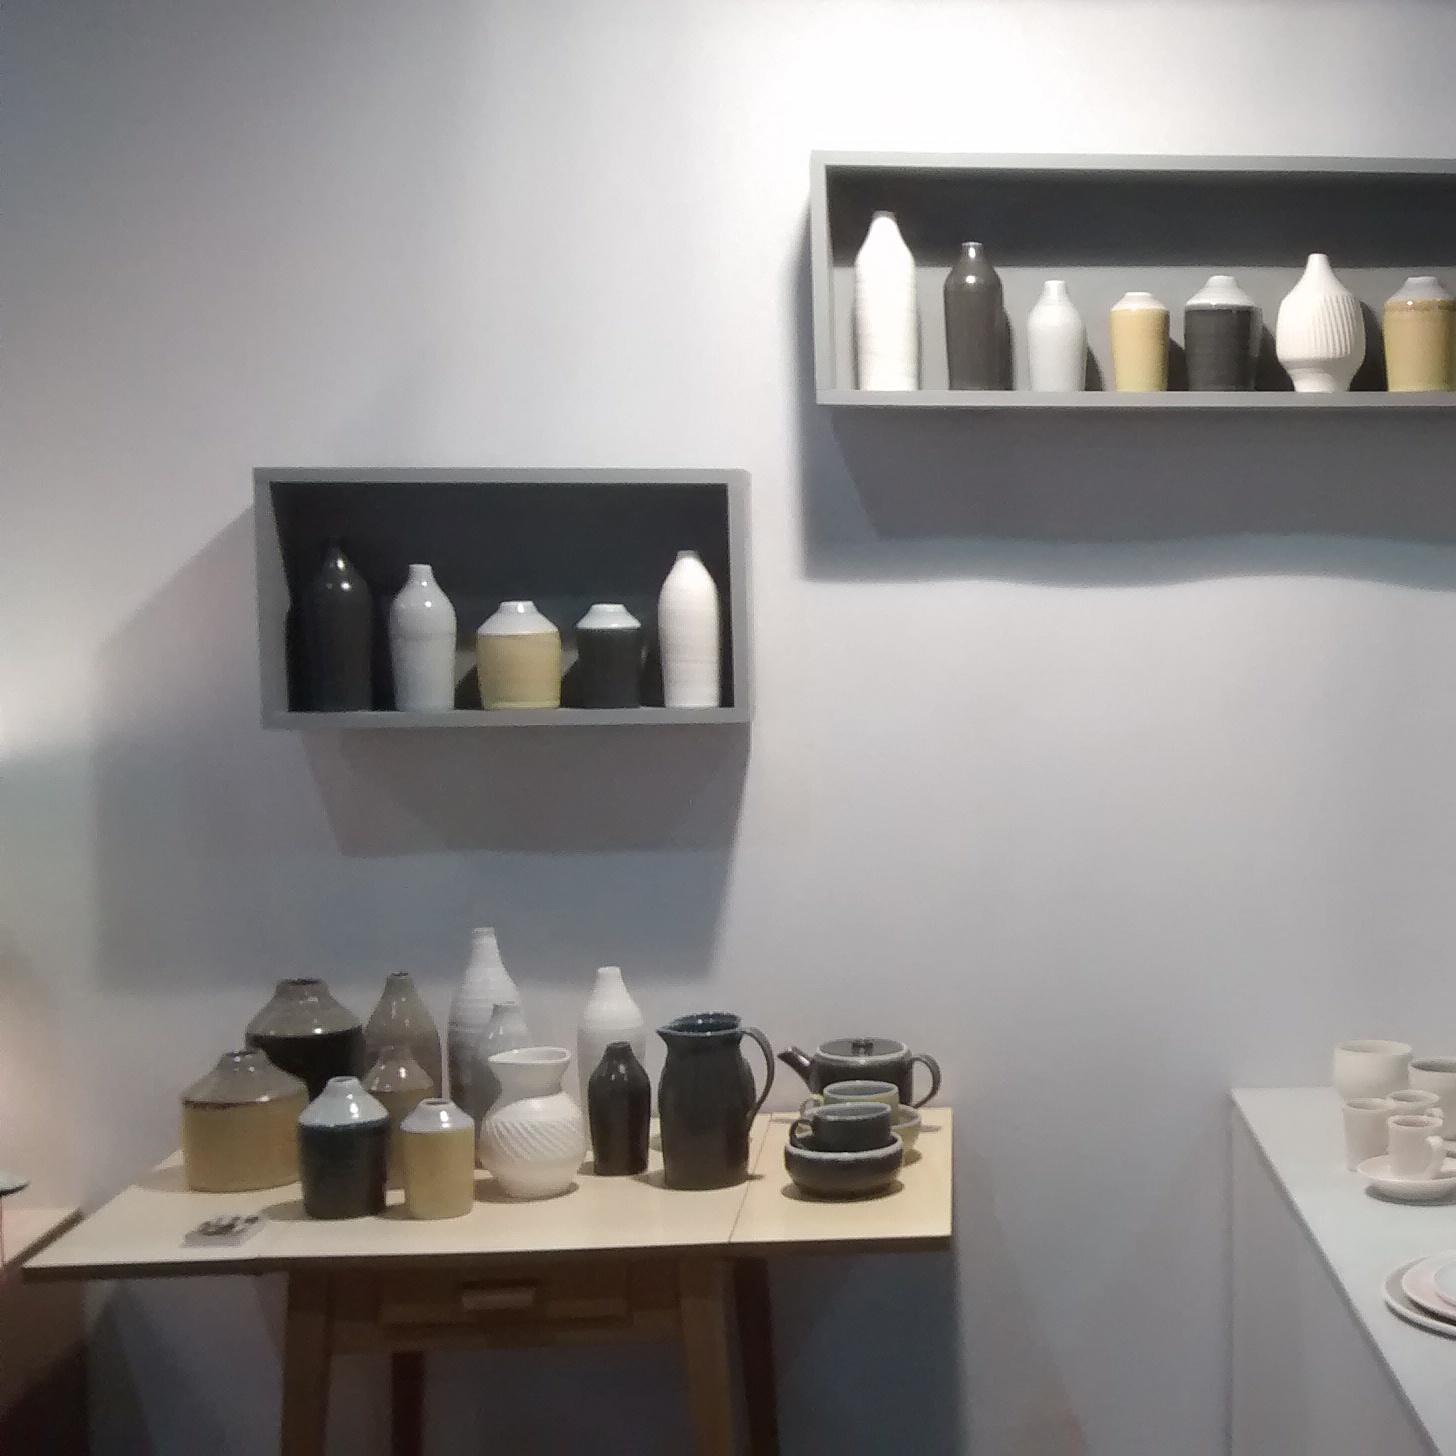 Ceramic bottles inspired by Morandi